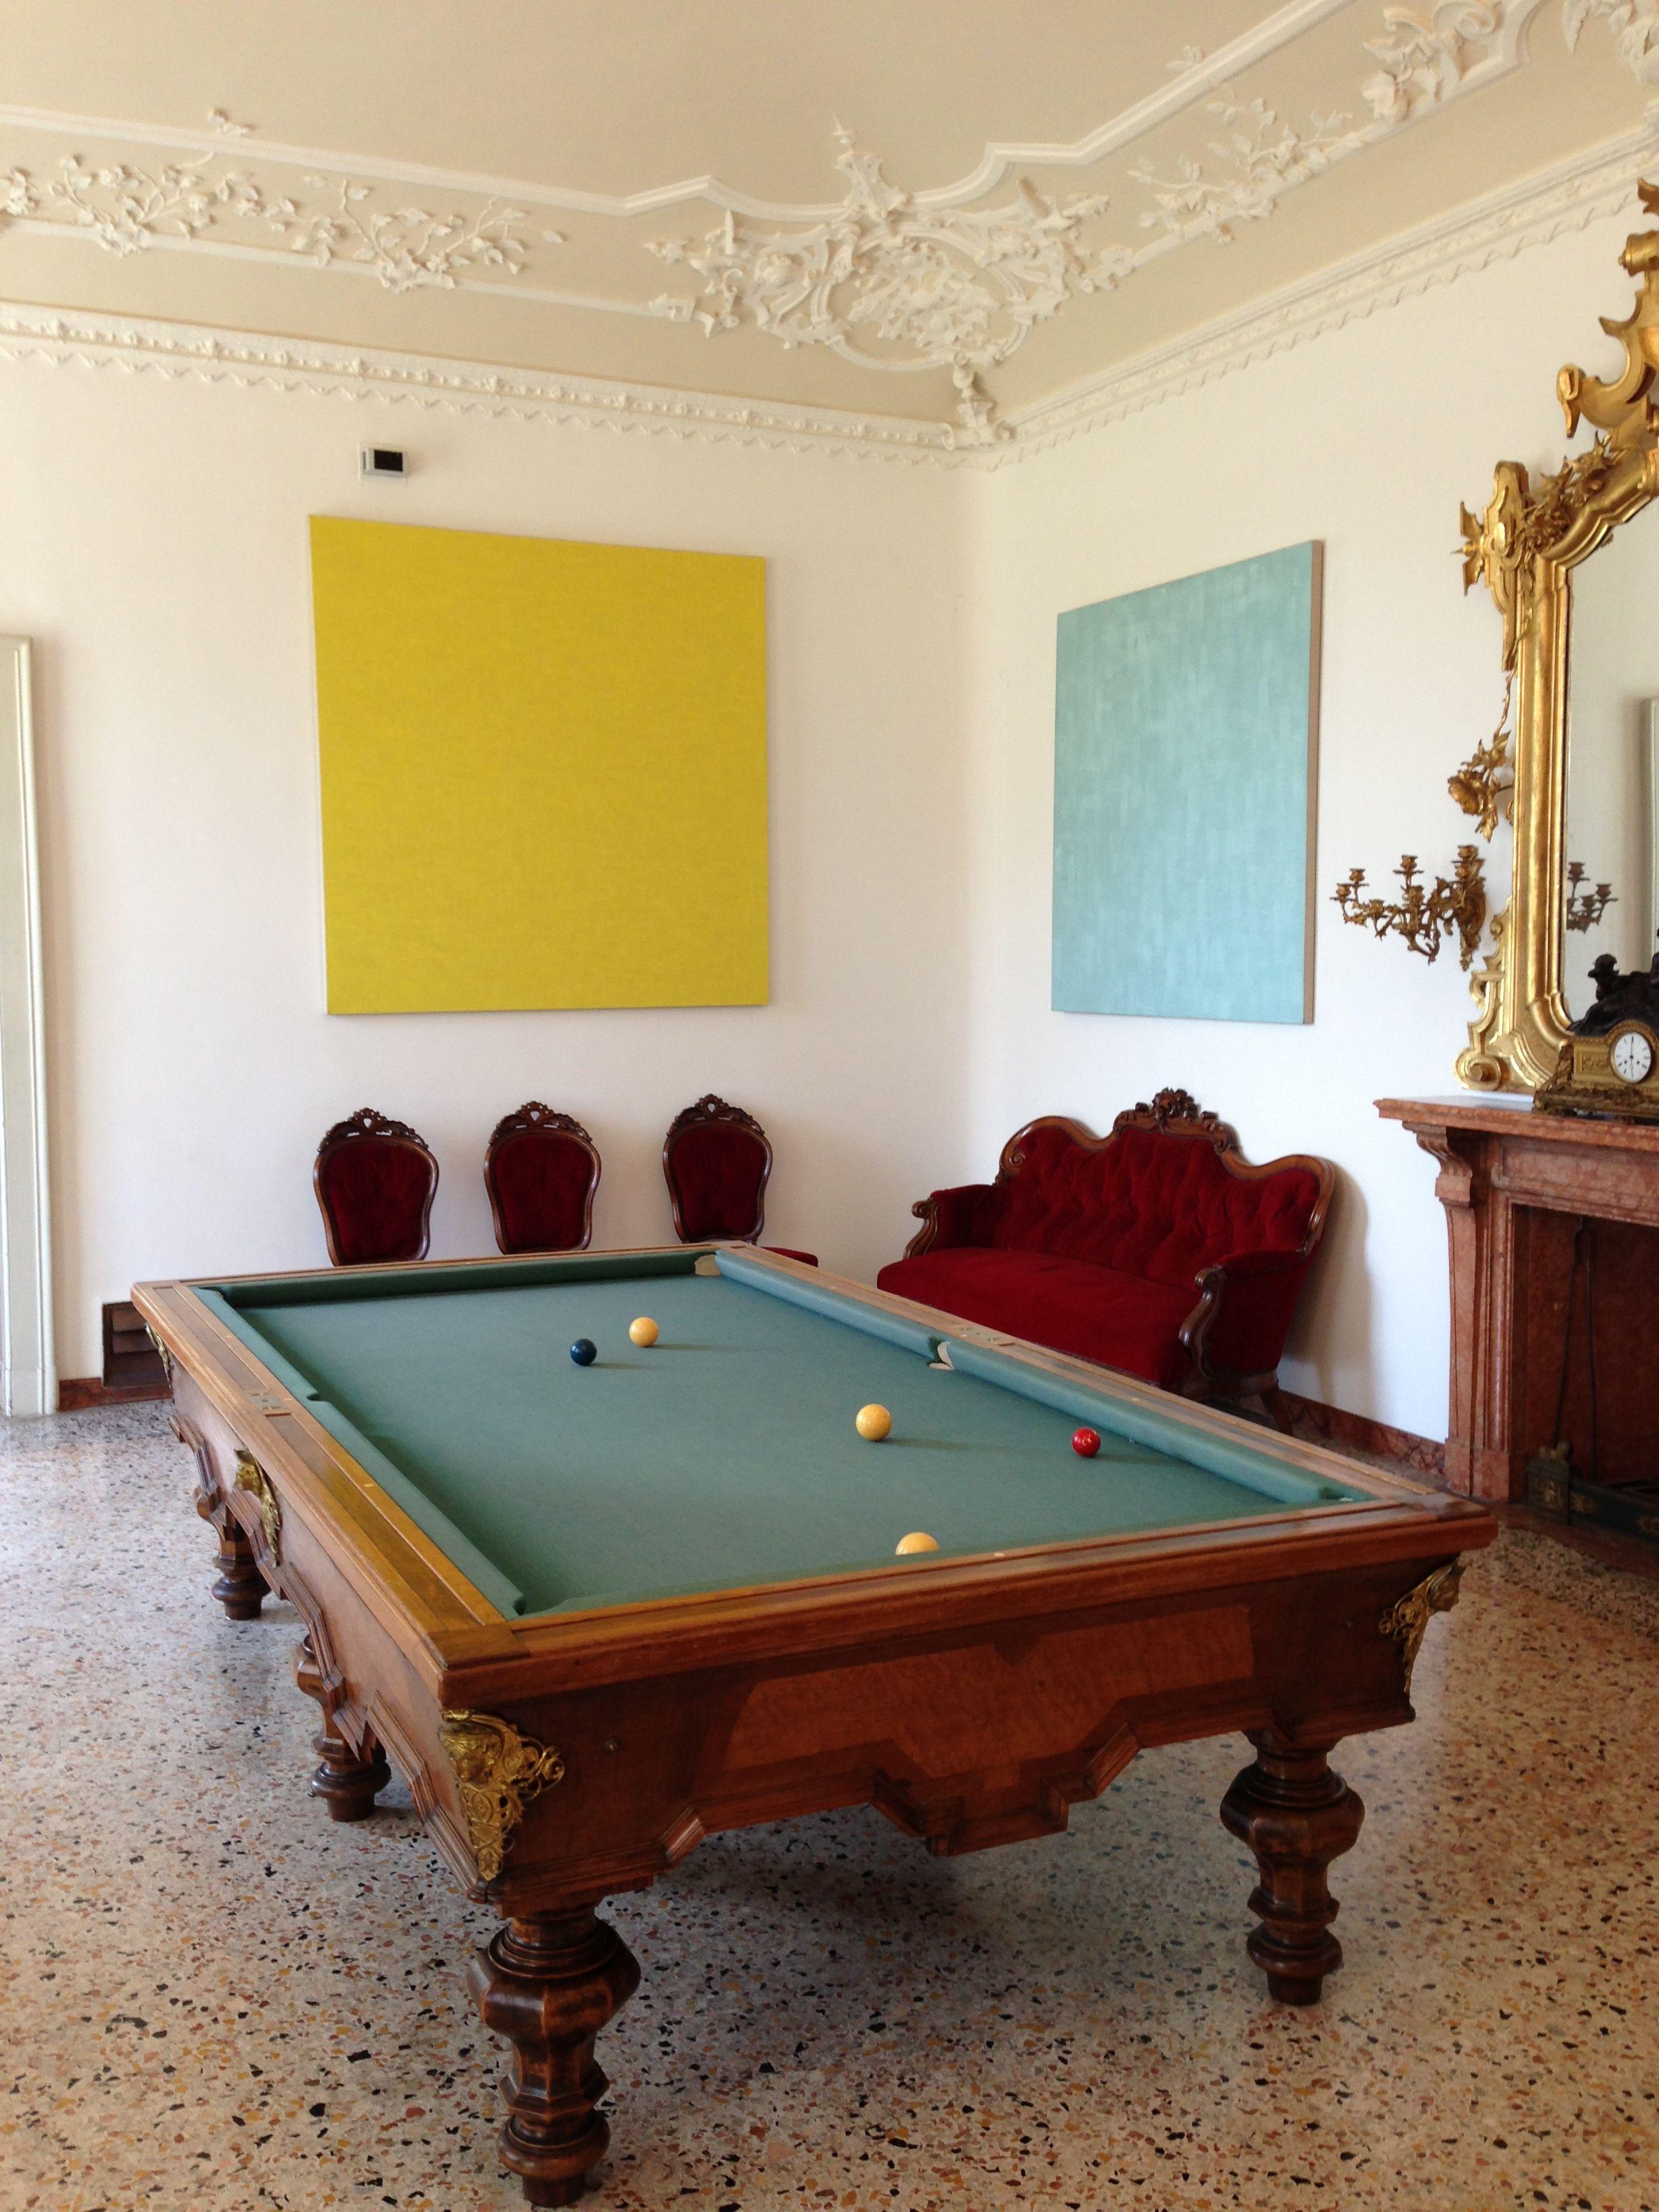 Monocromes at Villa Panza Collection